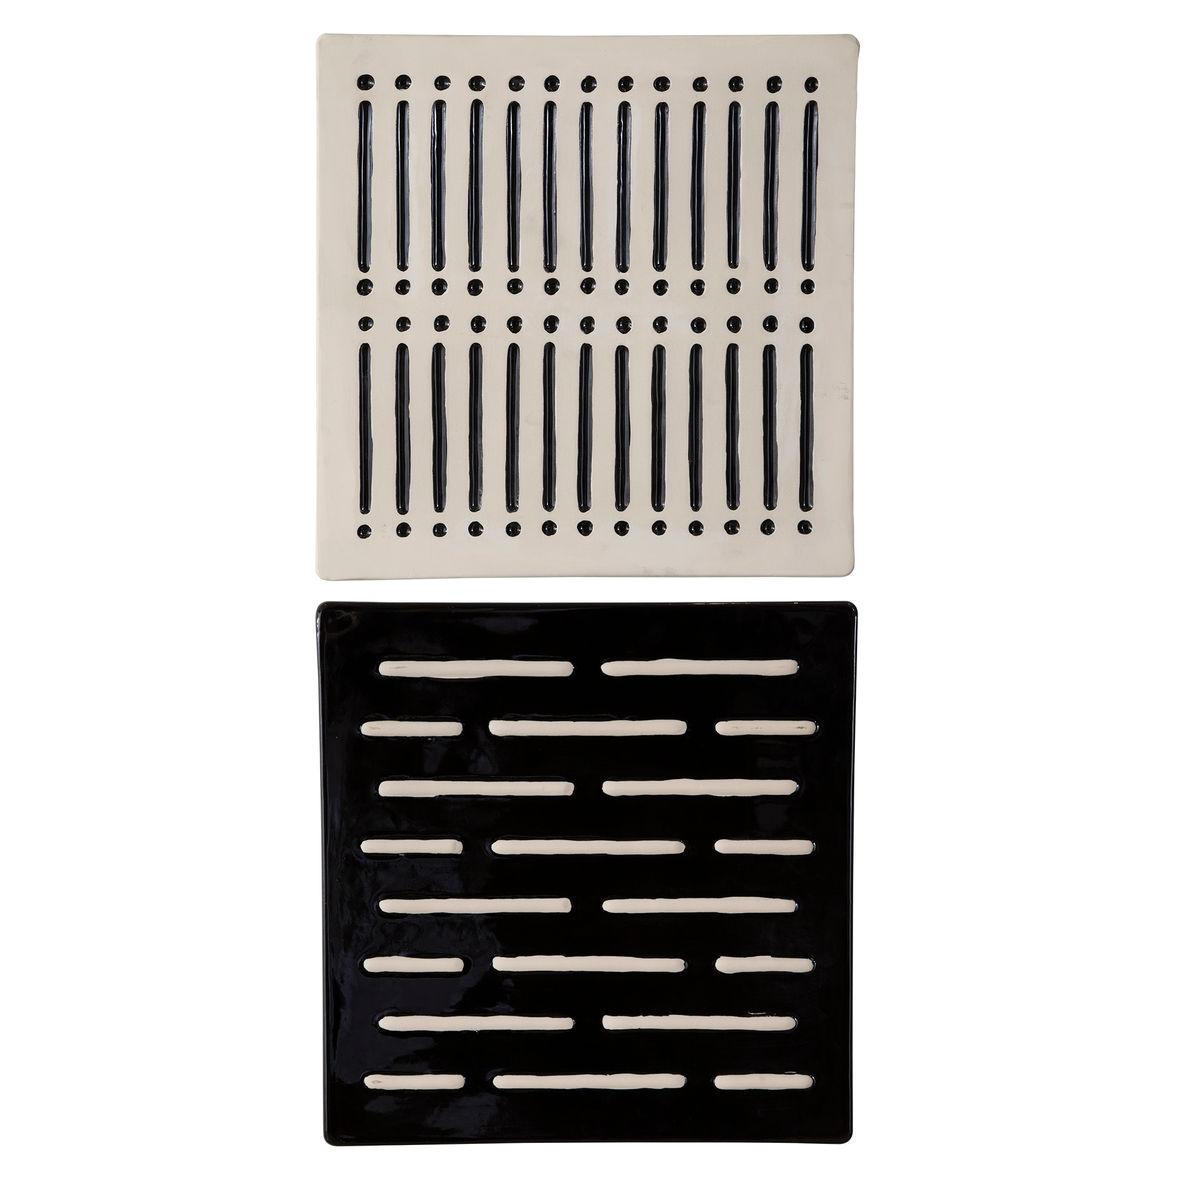 Domino Effect Modern Wall Decor, S/2